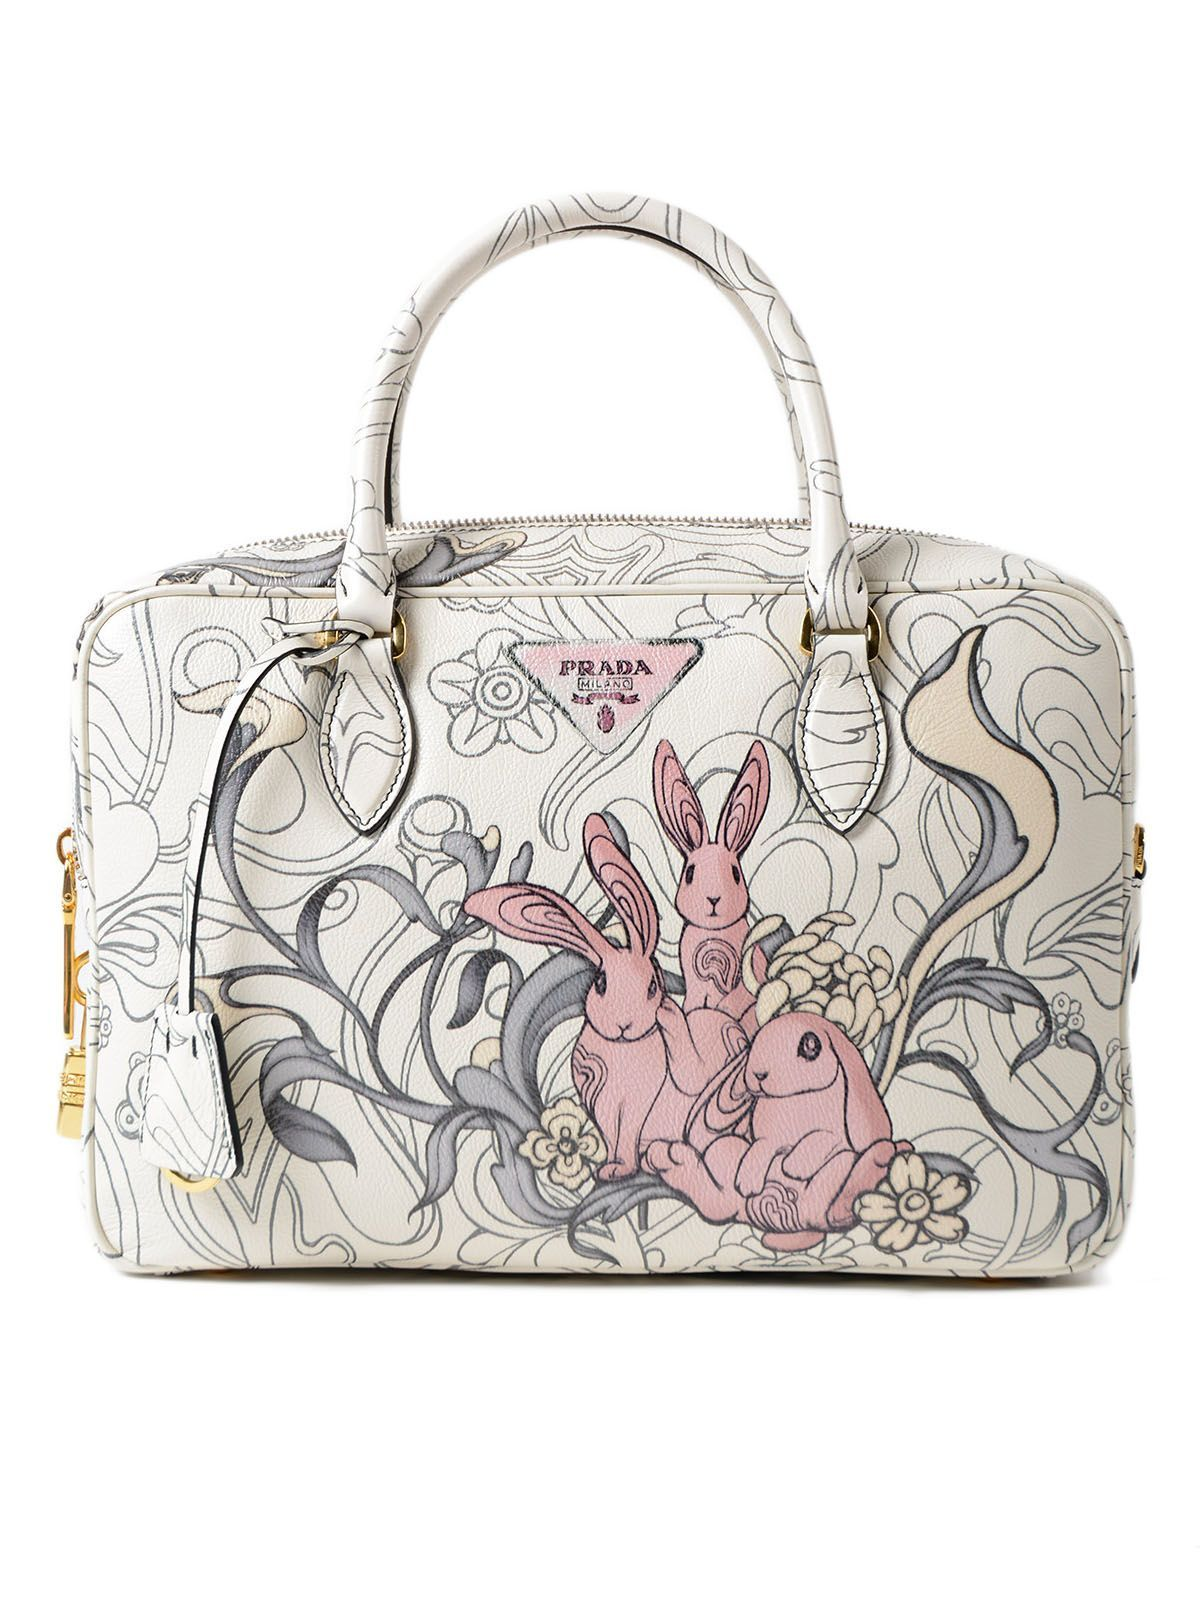 8250b6fdfdd8 PRADA GLACE CALF RABBIT HANDBAG.  prada  bags  leather  lace ...